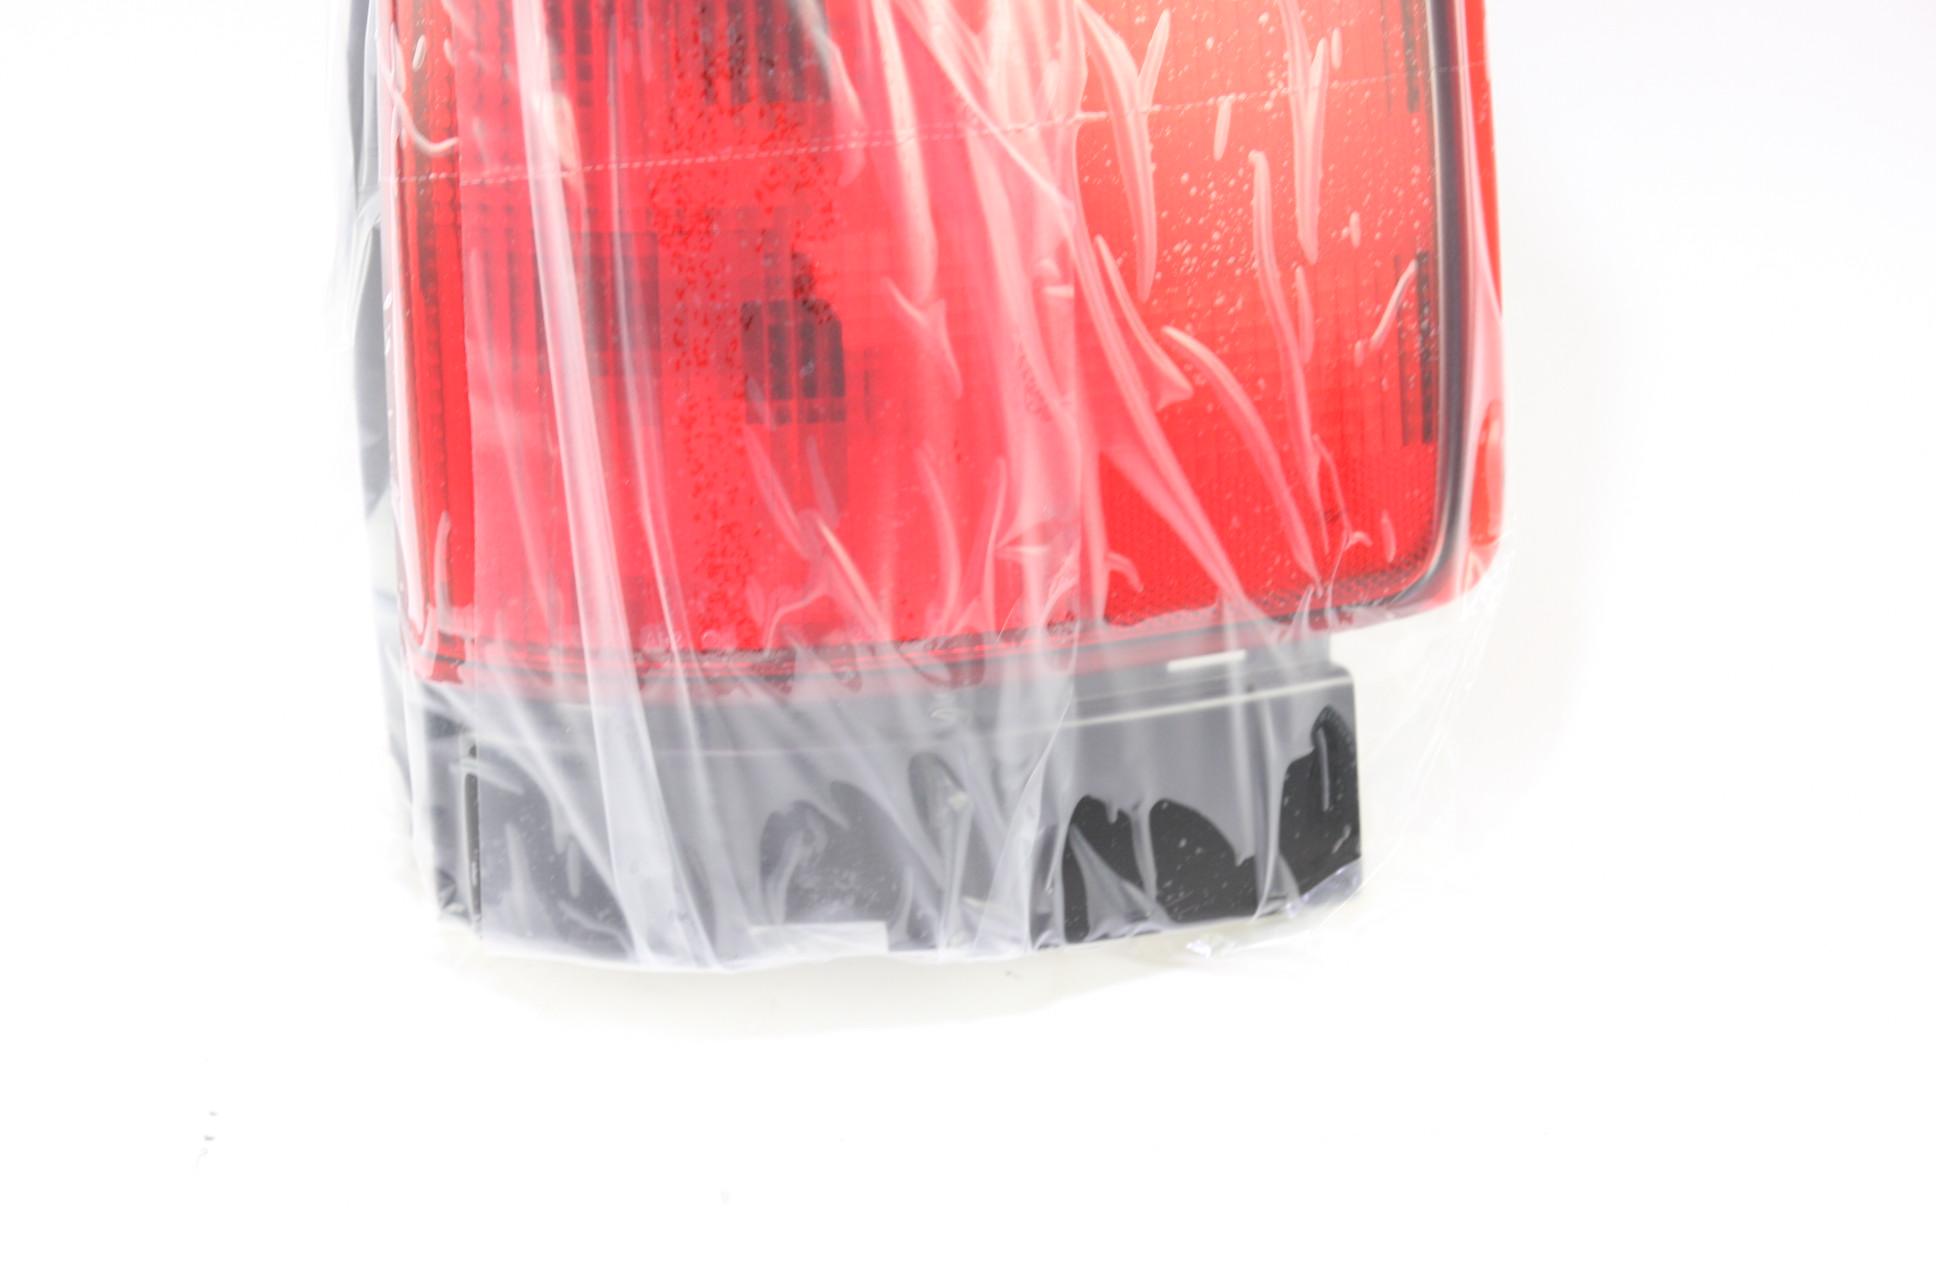 *New OEM GM 15131577 GMC Envoy 02-09 Right Rear Brake Taillight Taillamp Lens - image 4